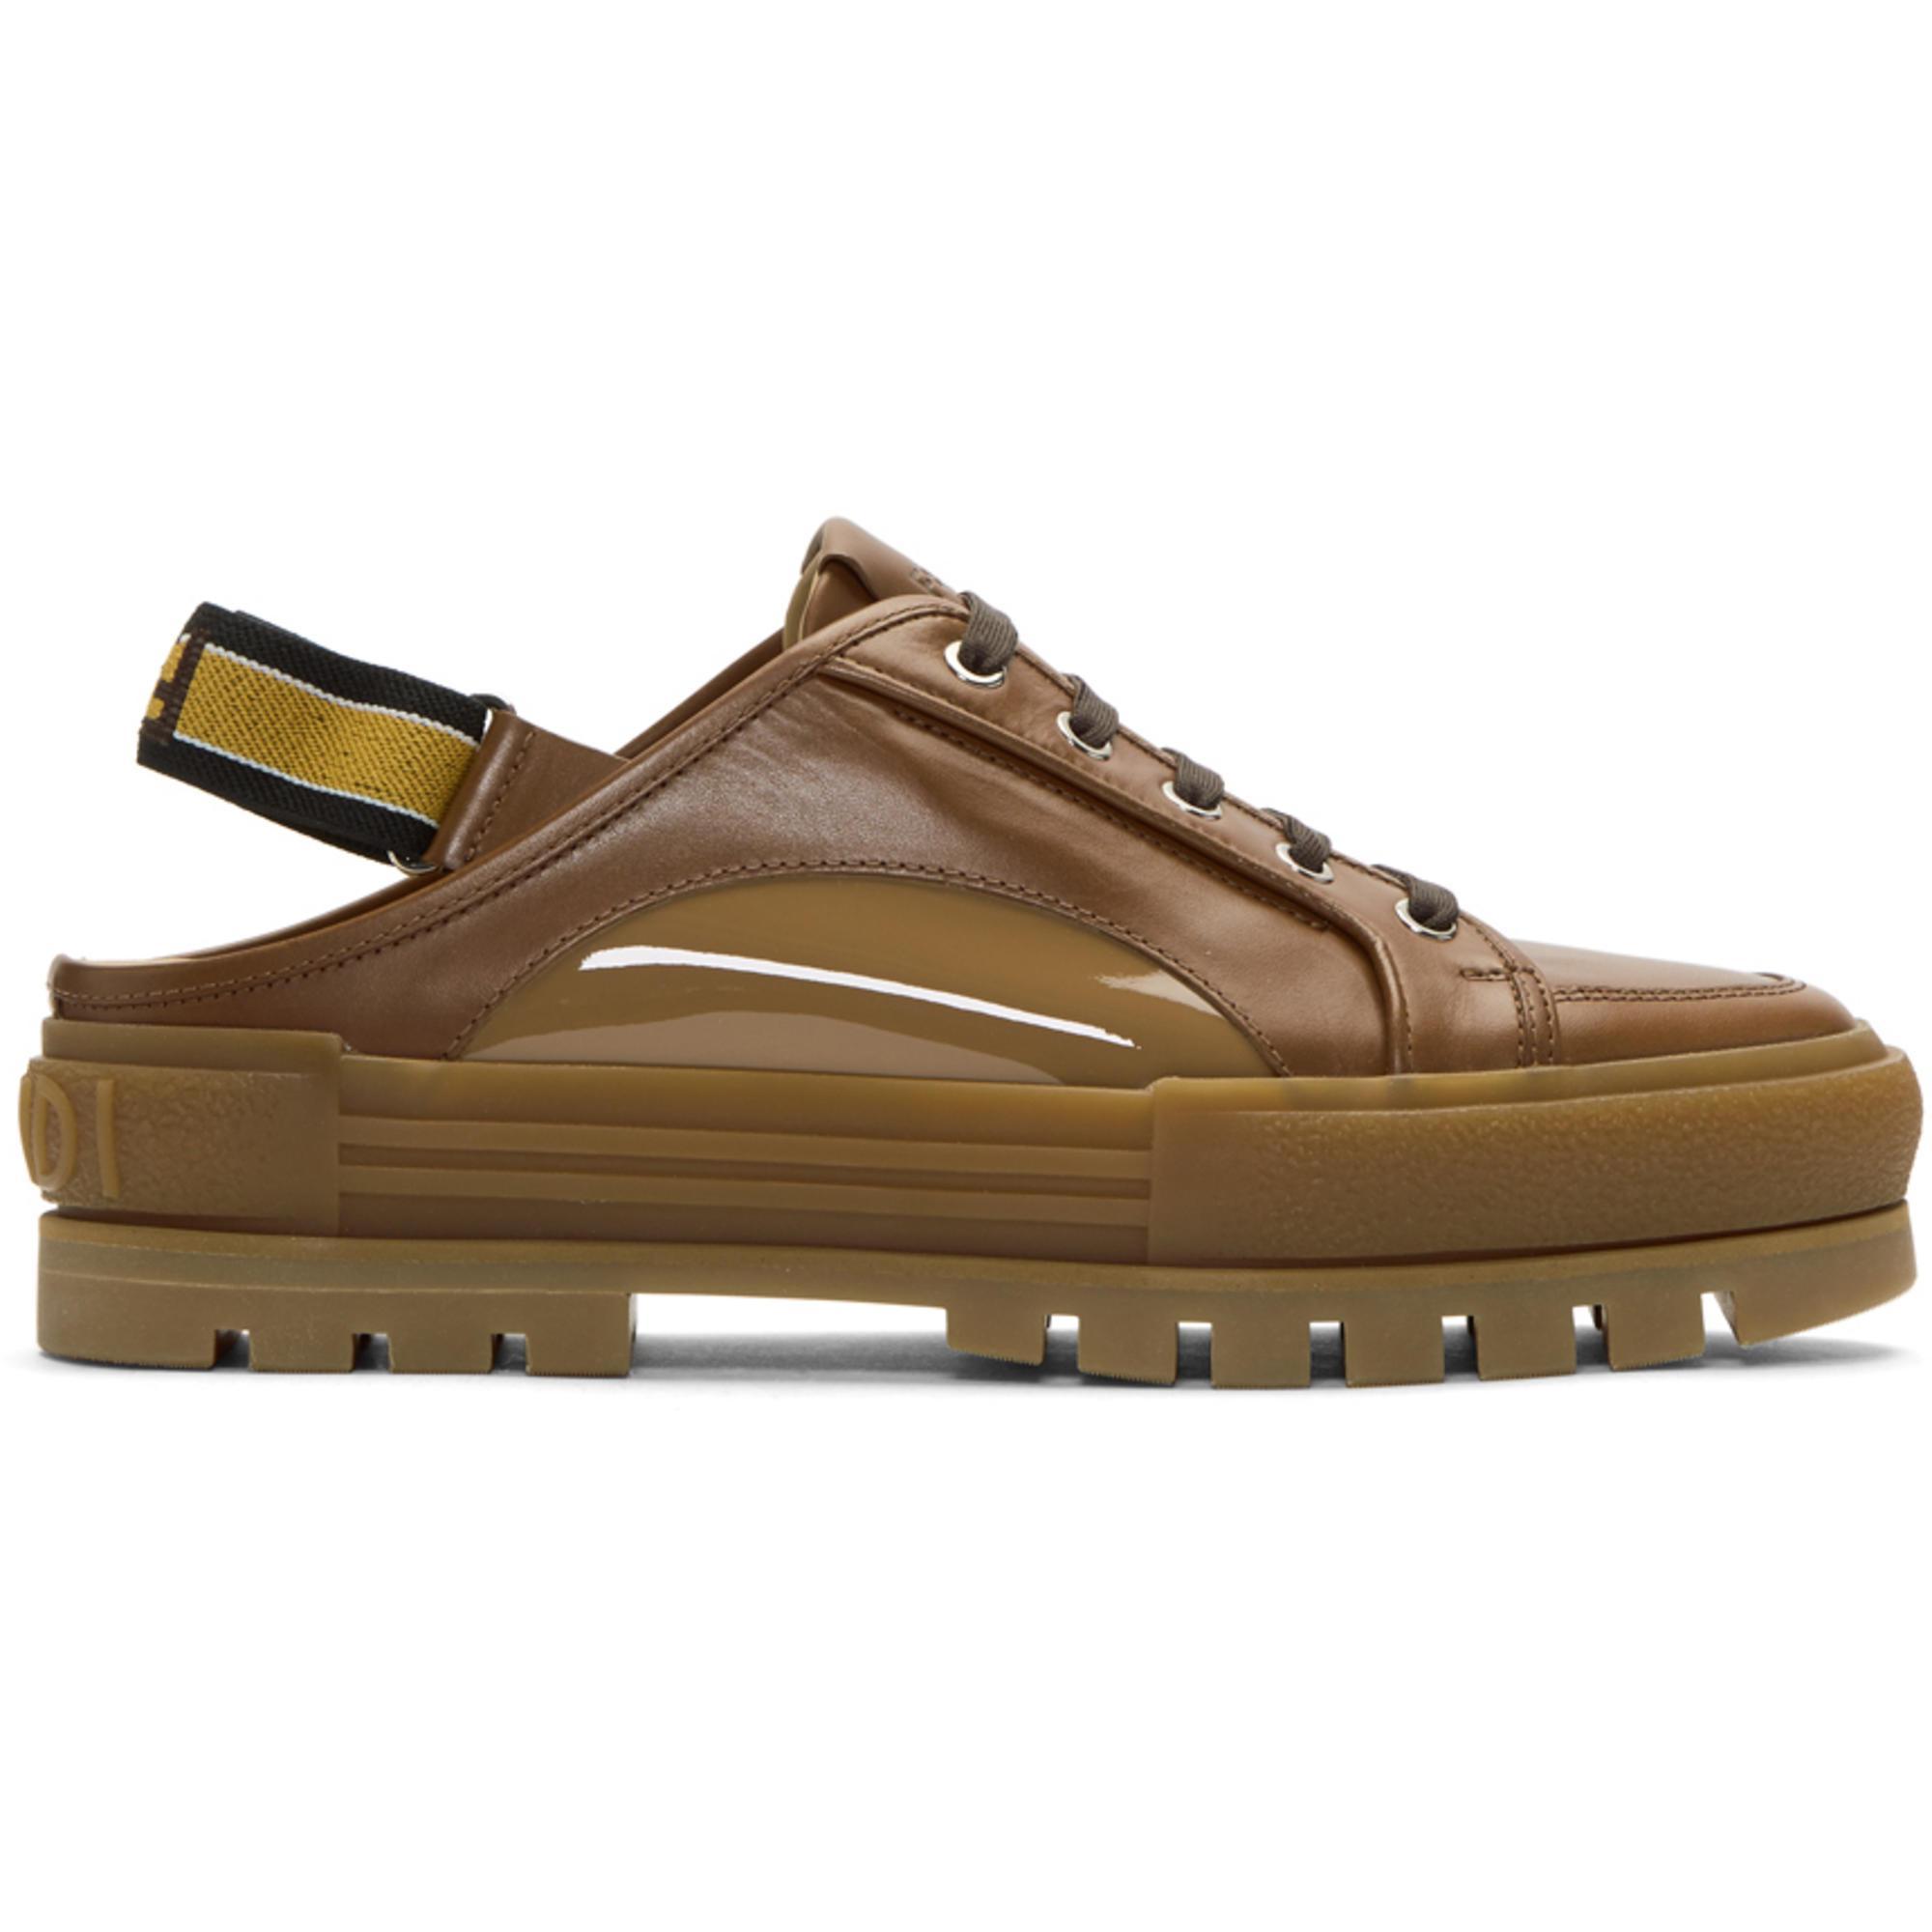 0fevGlPWTc Brown Forever Fendi Slingback Sneakers fj5FlIOy